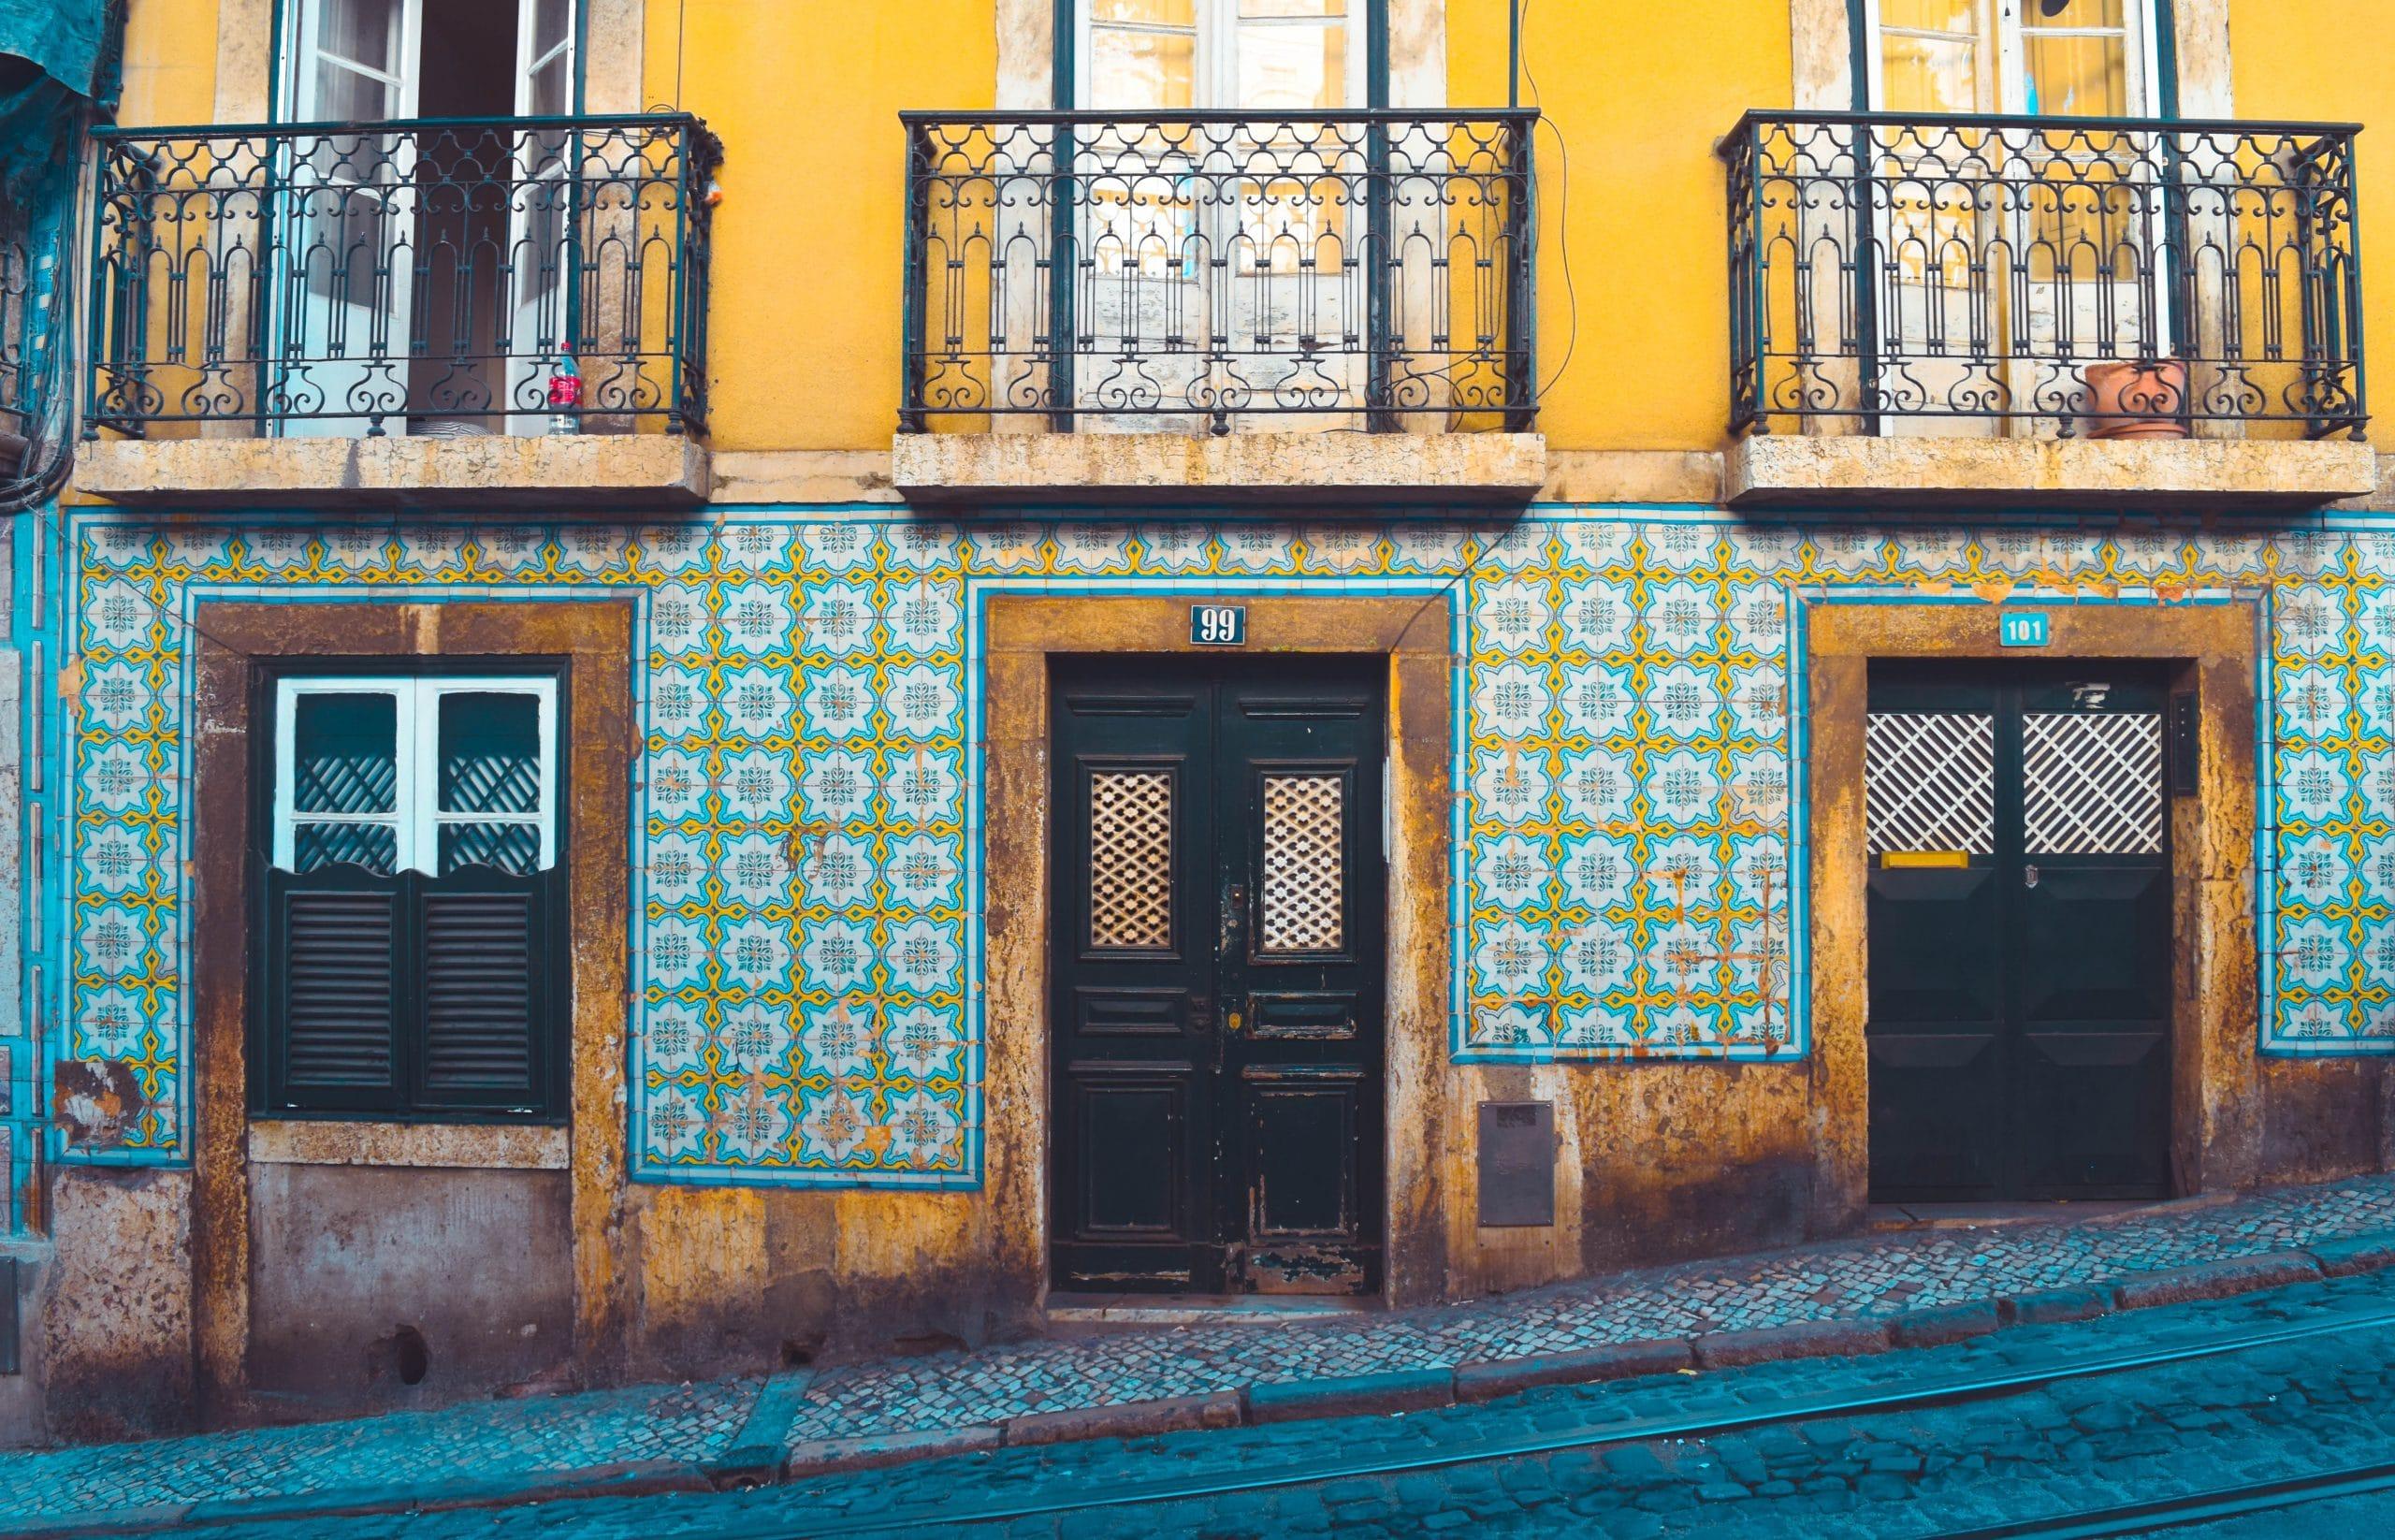 Bolig og job i Portugal